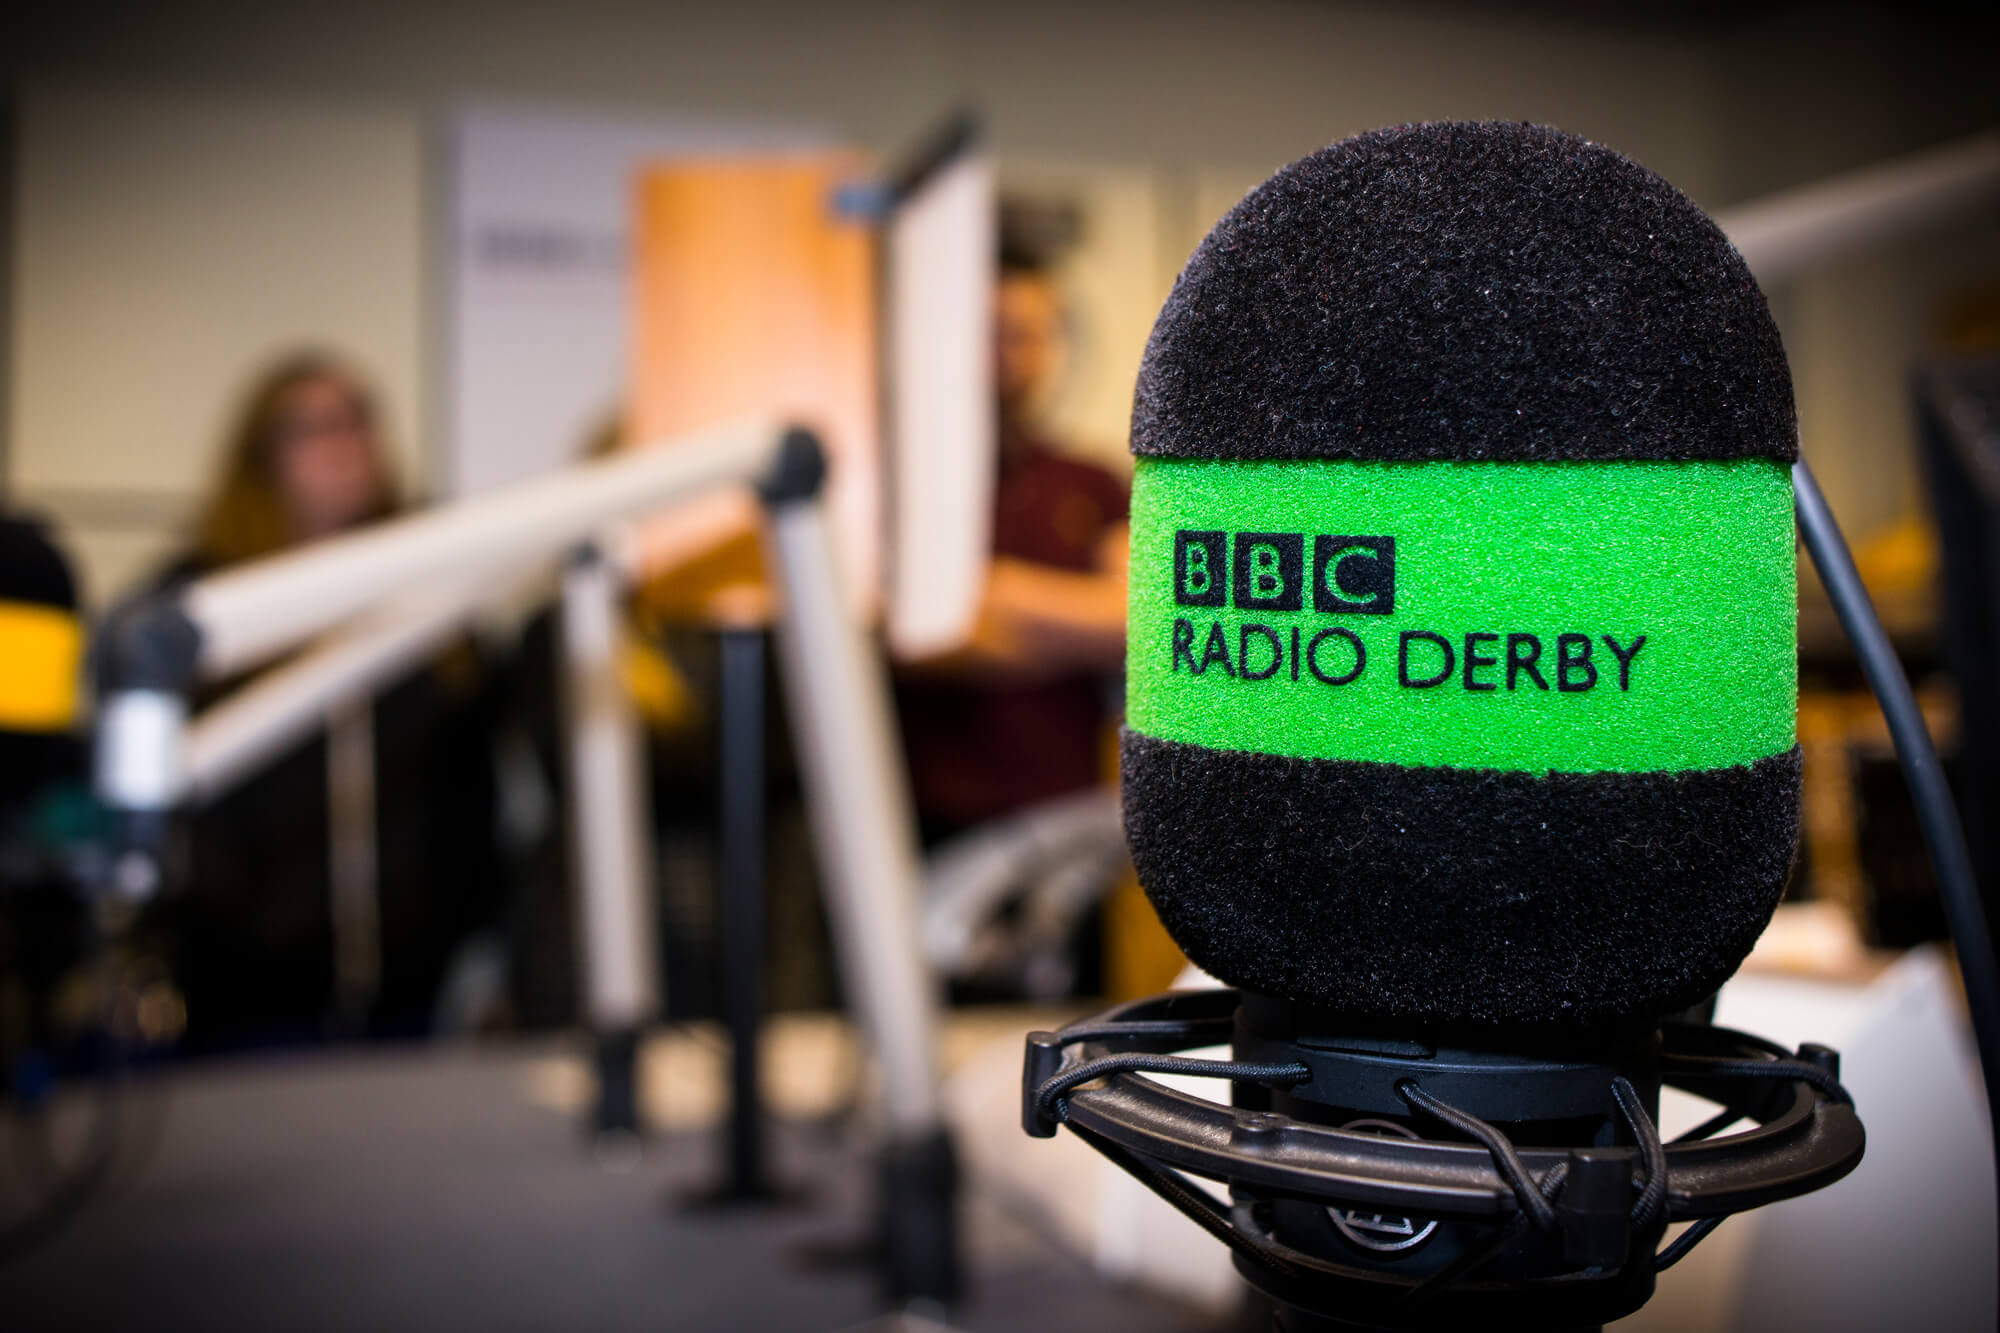 BBC Radio Derby microphone in foreground